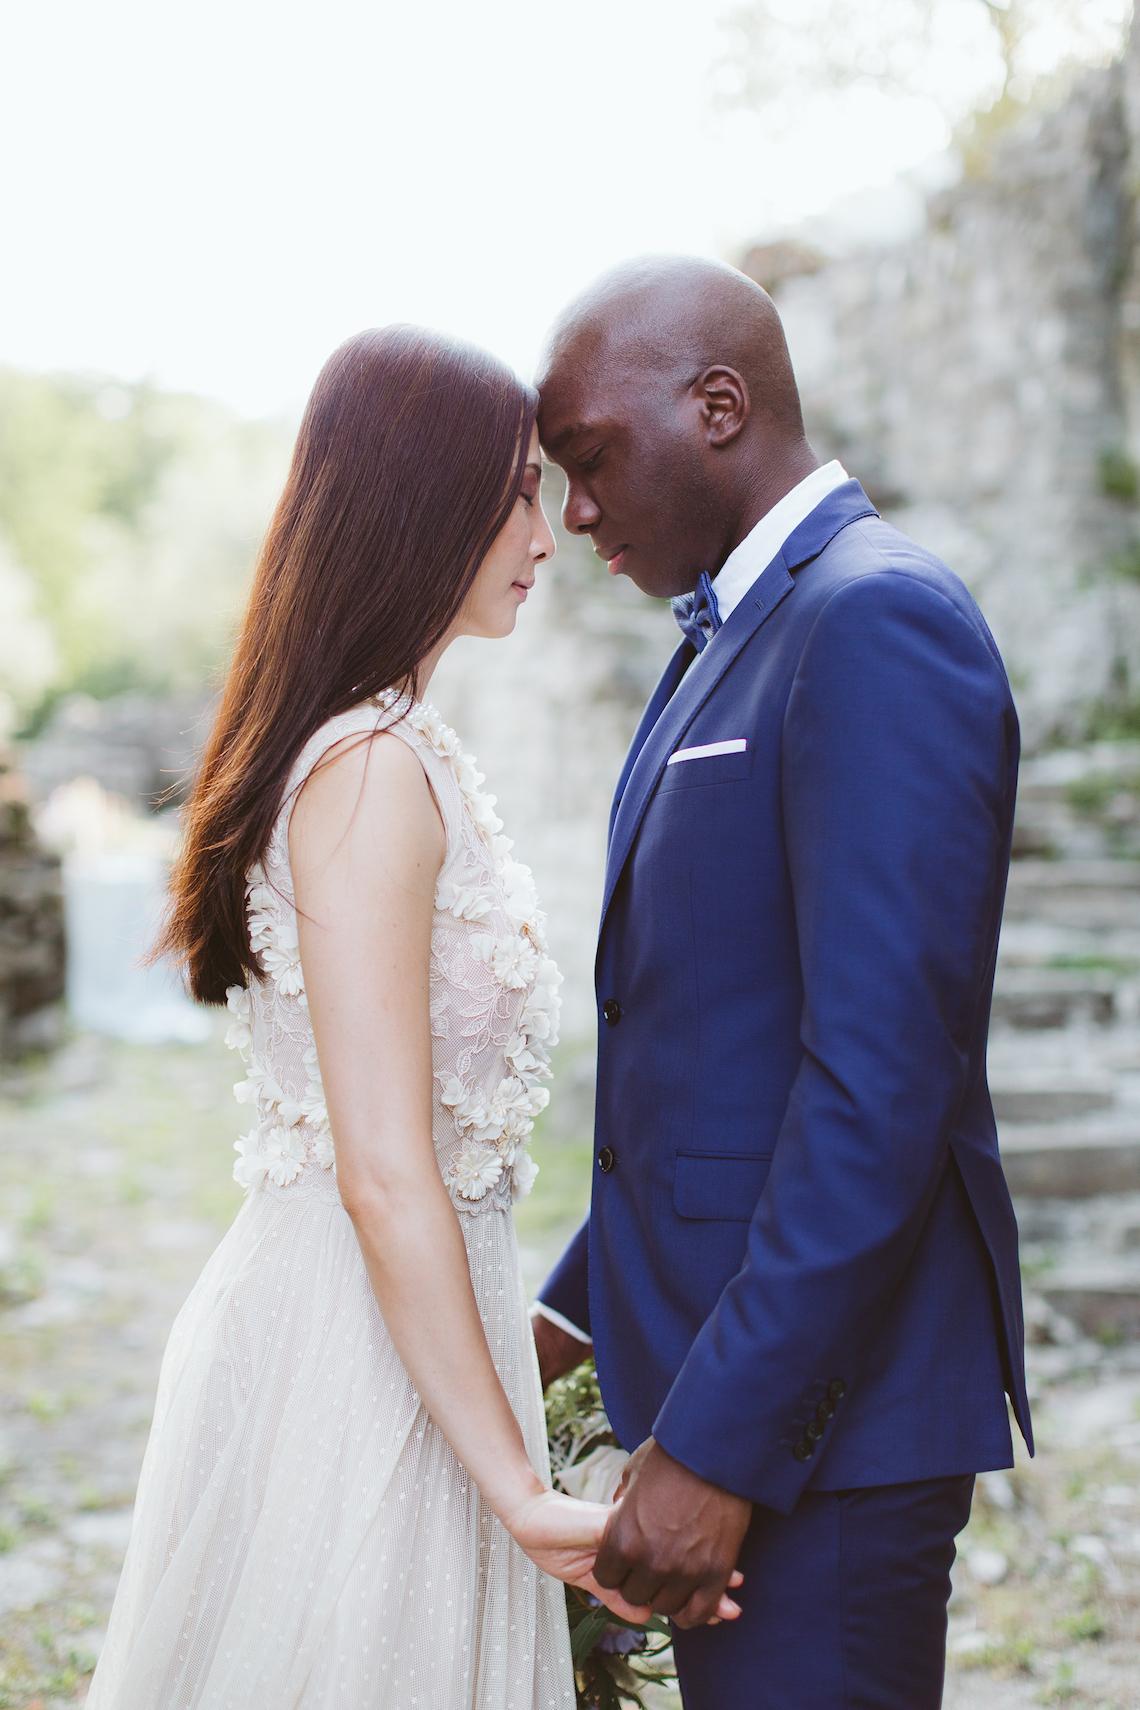 Calm, Ethereal & Romantic Lake Como Wedding Inspiration | Valentina Operandi 29